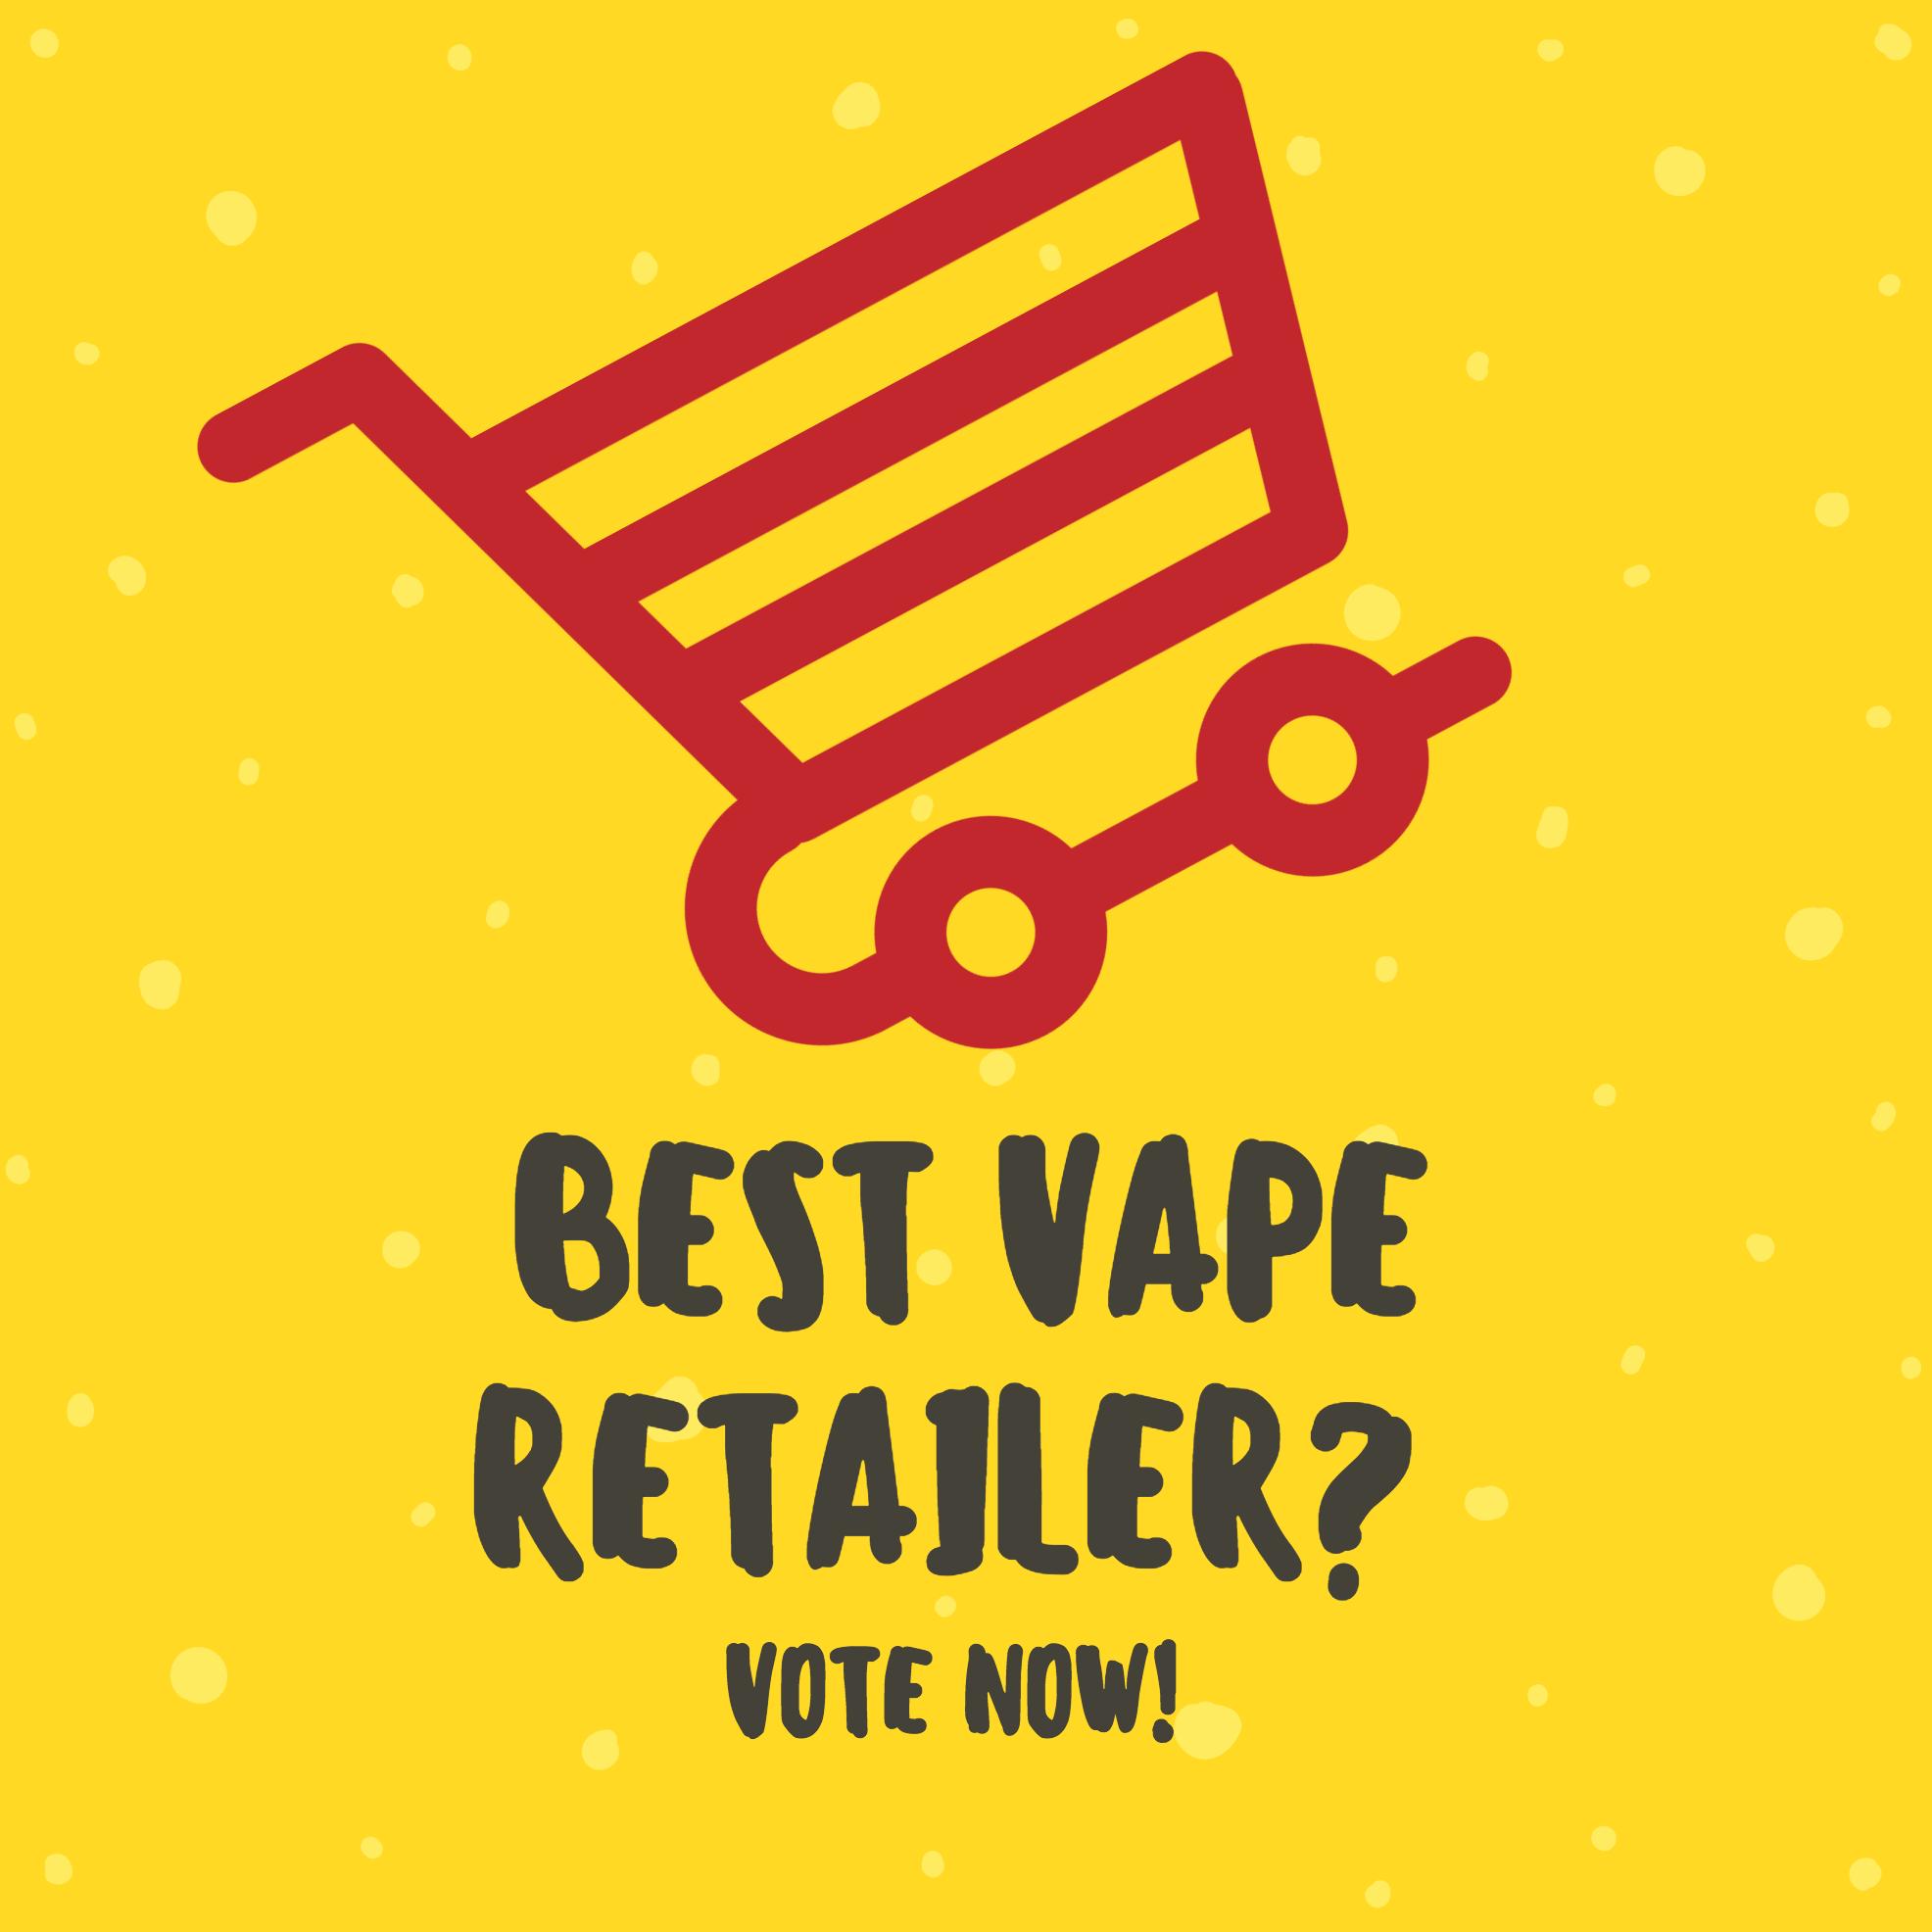 Best vape retailer | VapeBeat